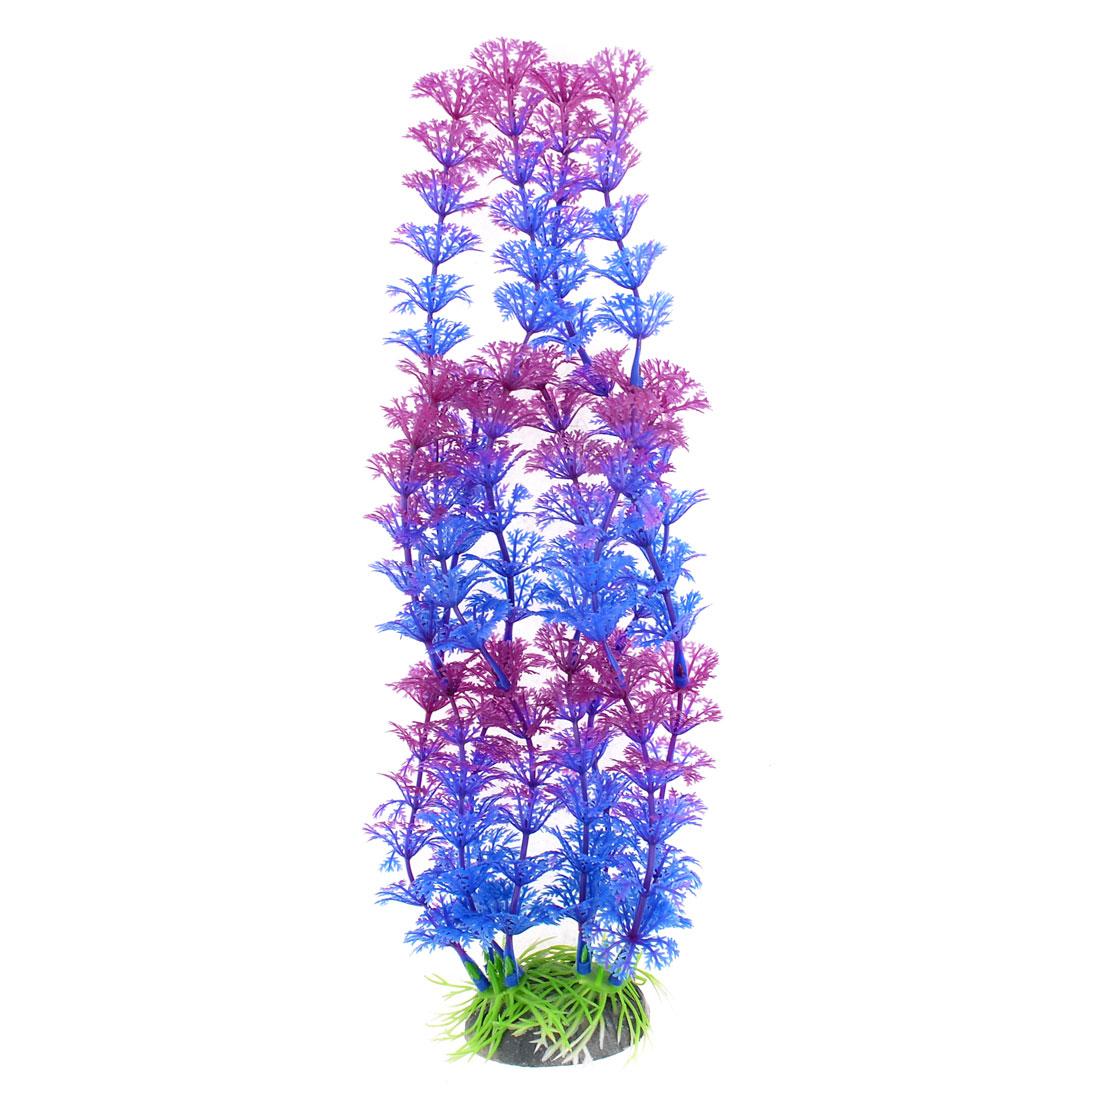 Purple Blue Snowflower Shaped Aquarium Decor Ceramic Base Aquatic Plant